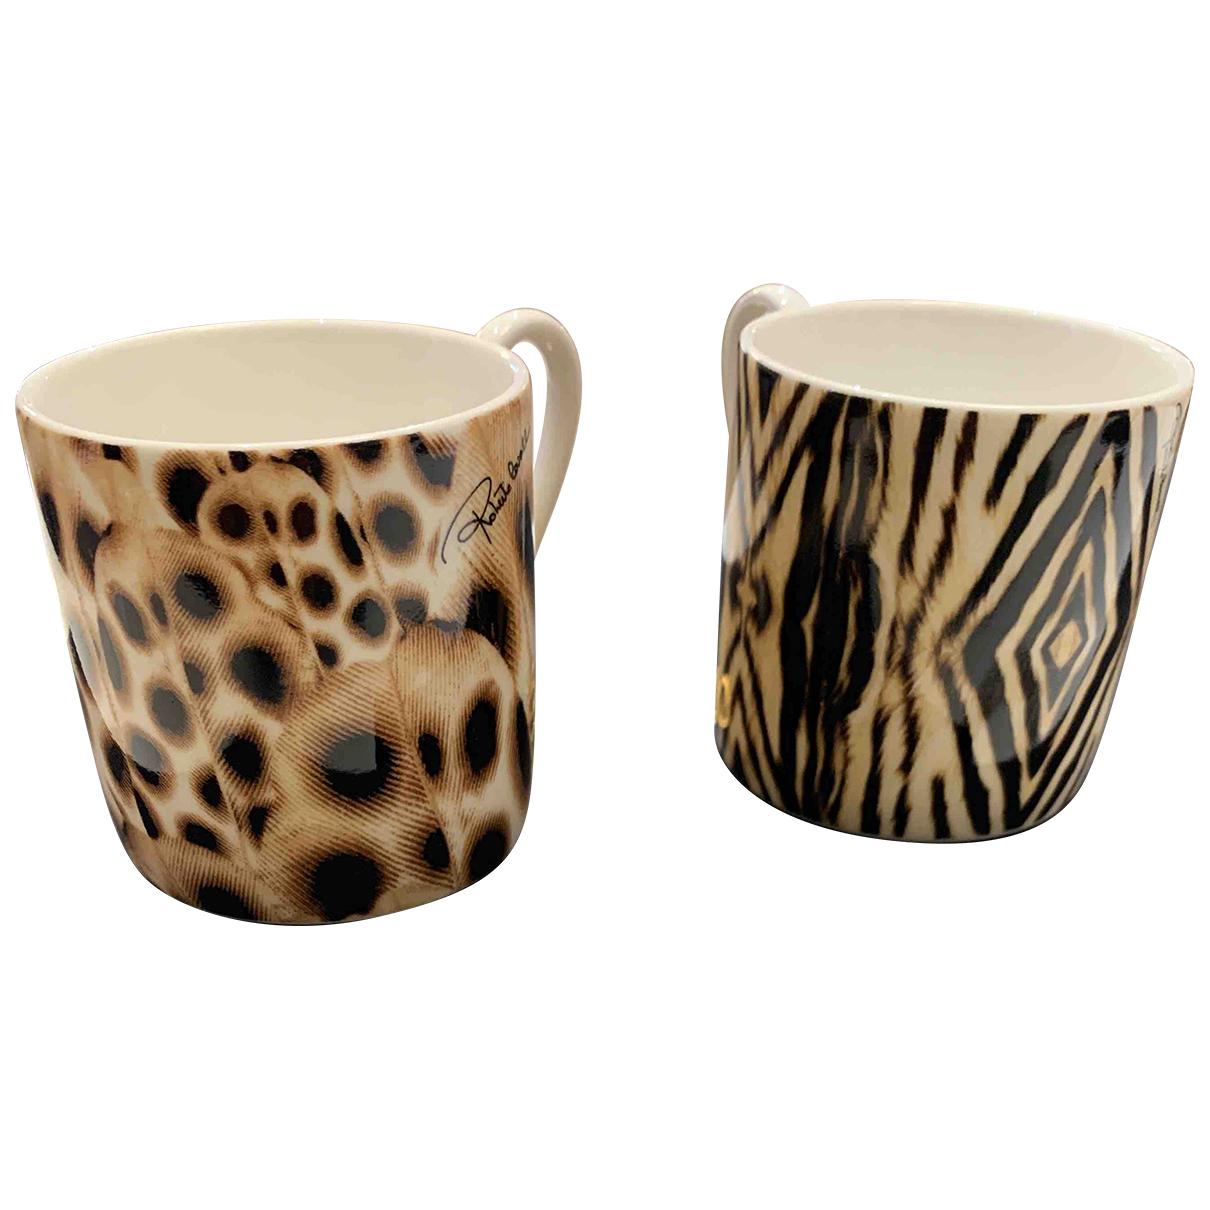 Juego de te/cafe de Porcelana Roberto Cavalli